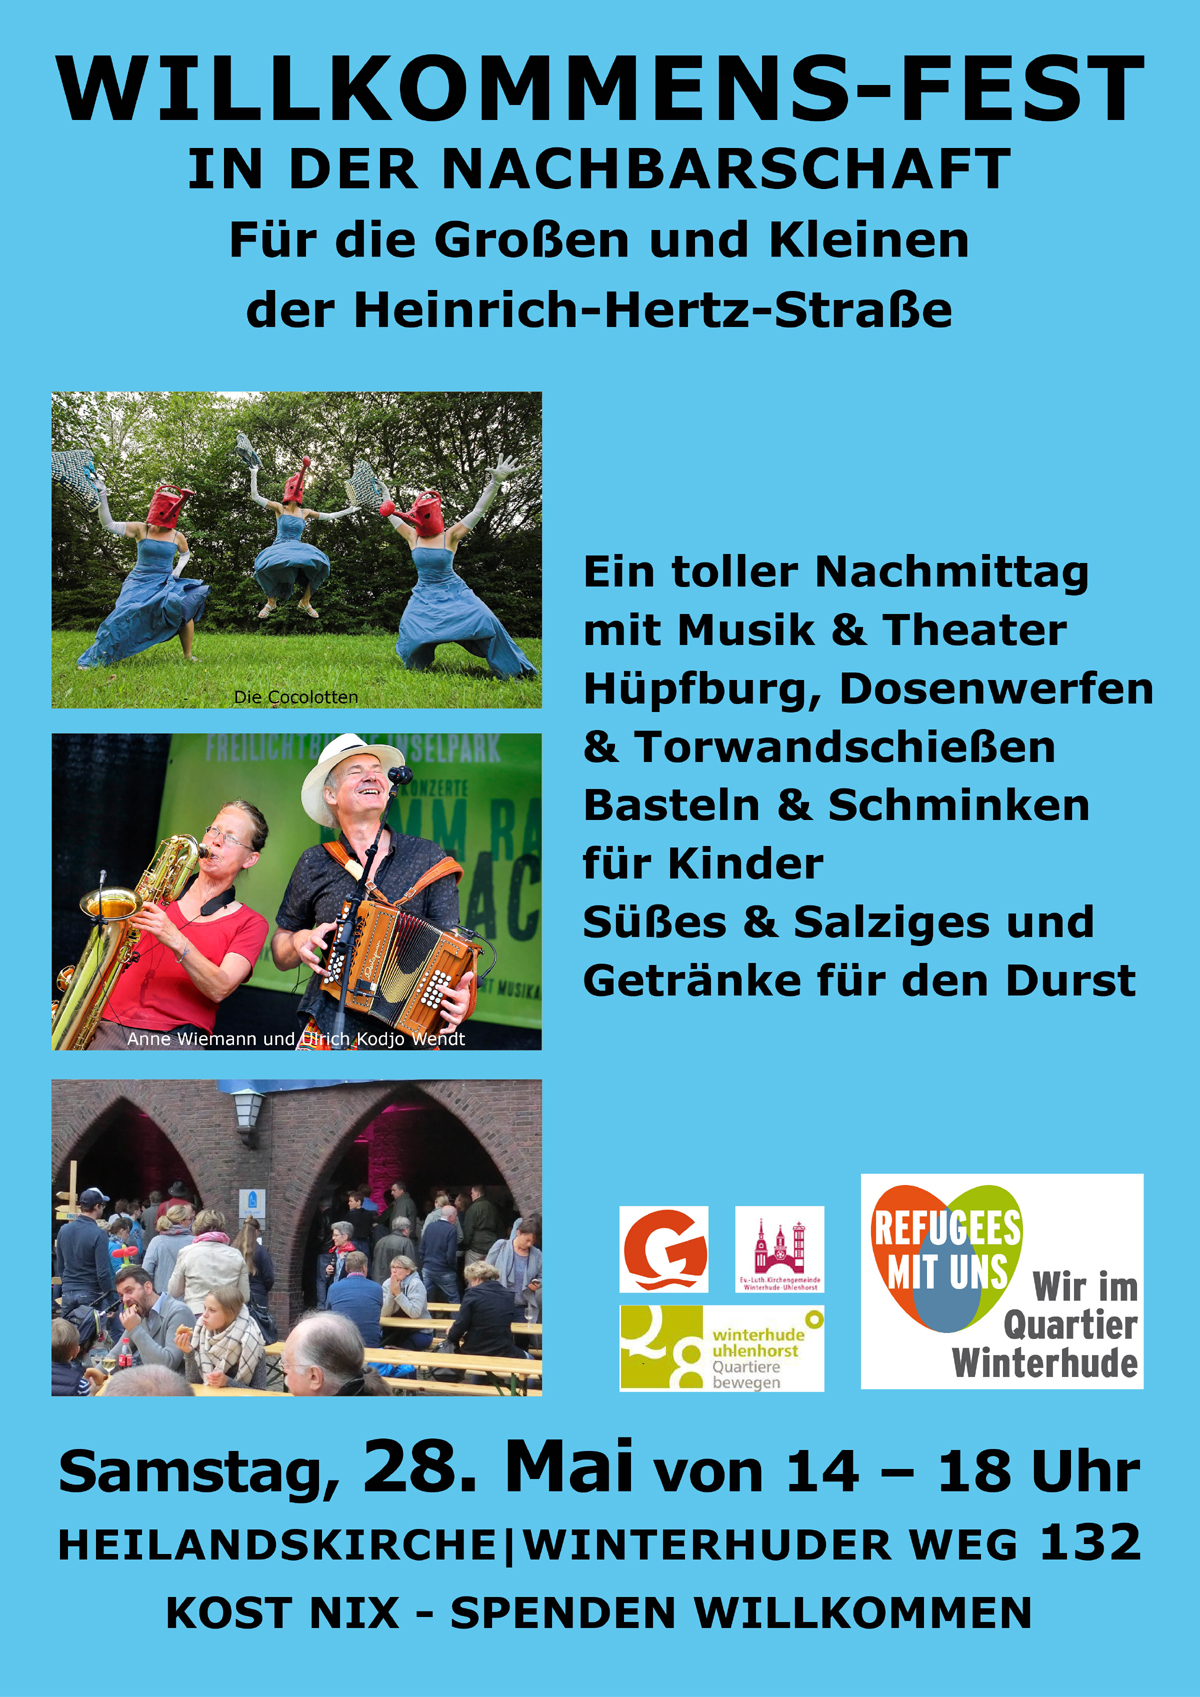 2016_05_28_Willkommensfest_Plakat_Klein2